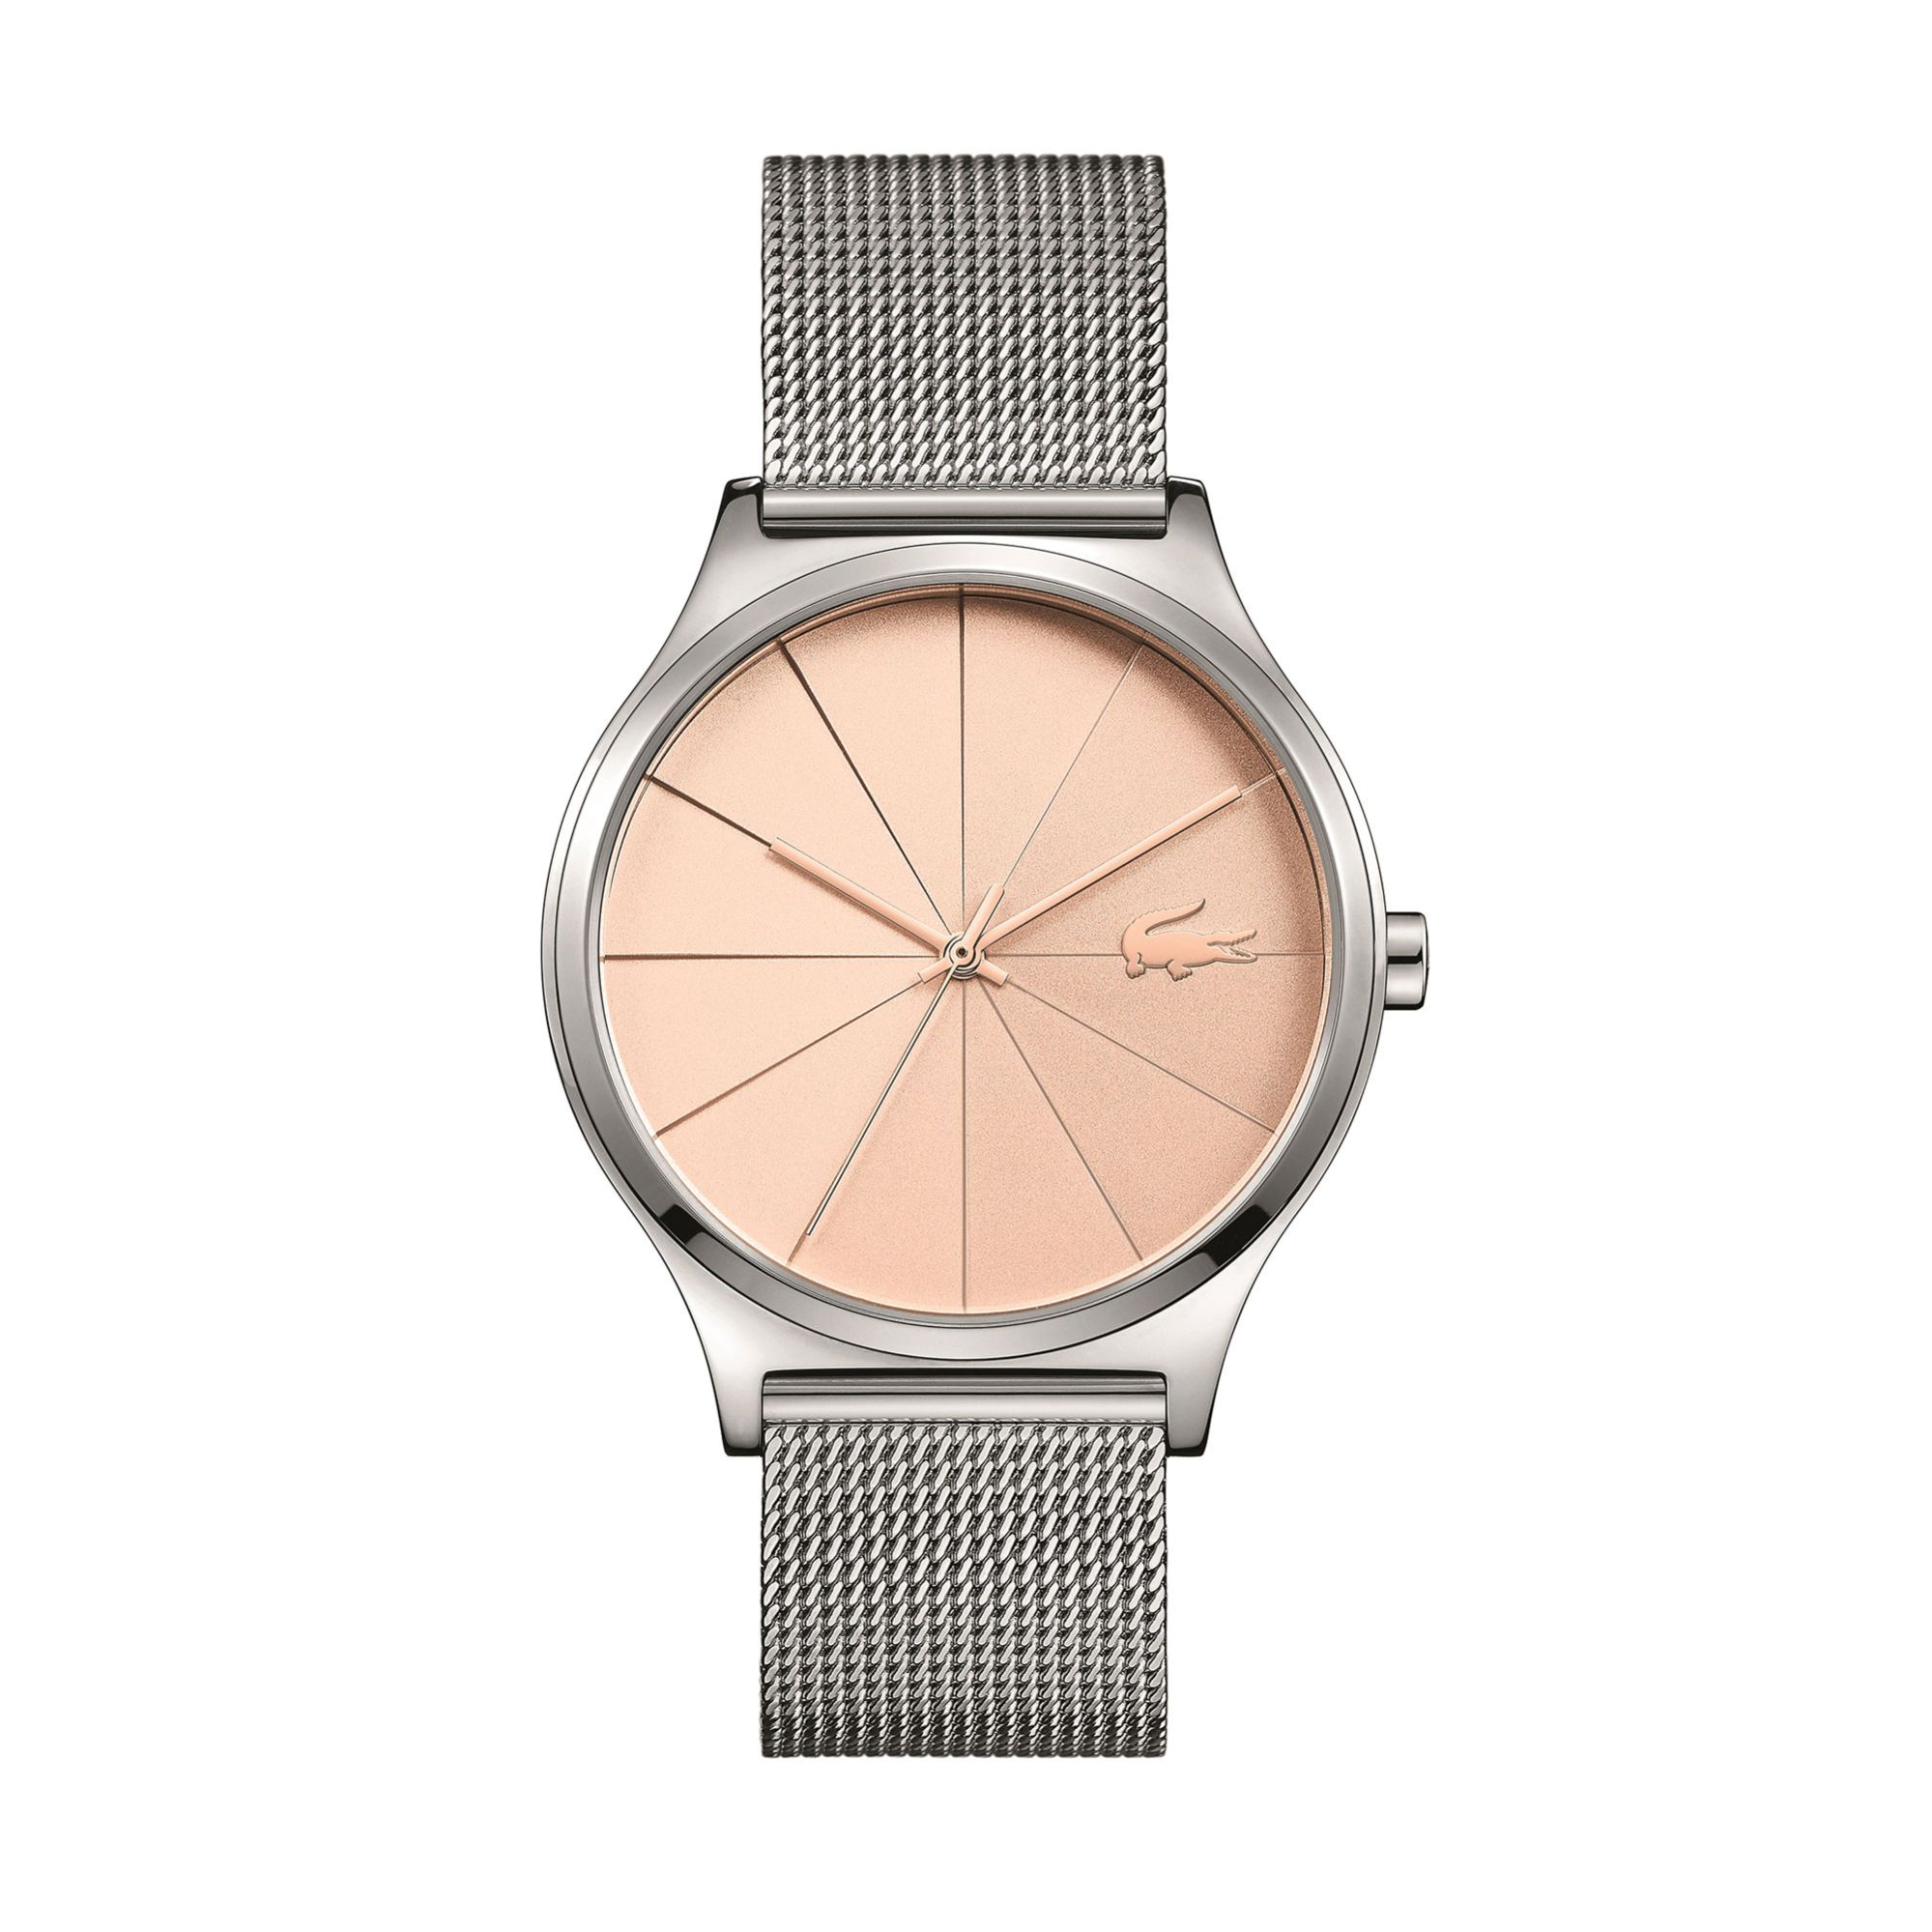 Lacoste годинник жіночий Nikita